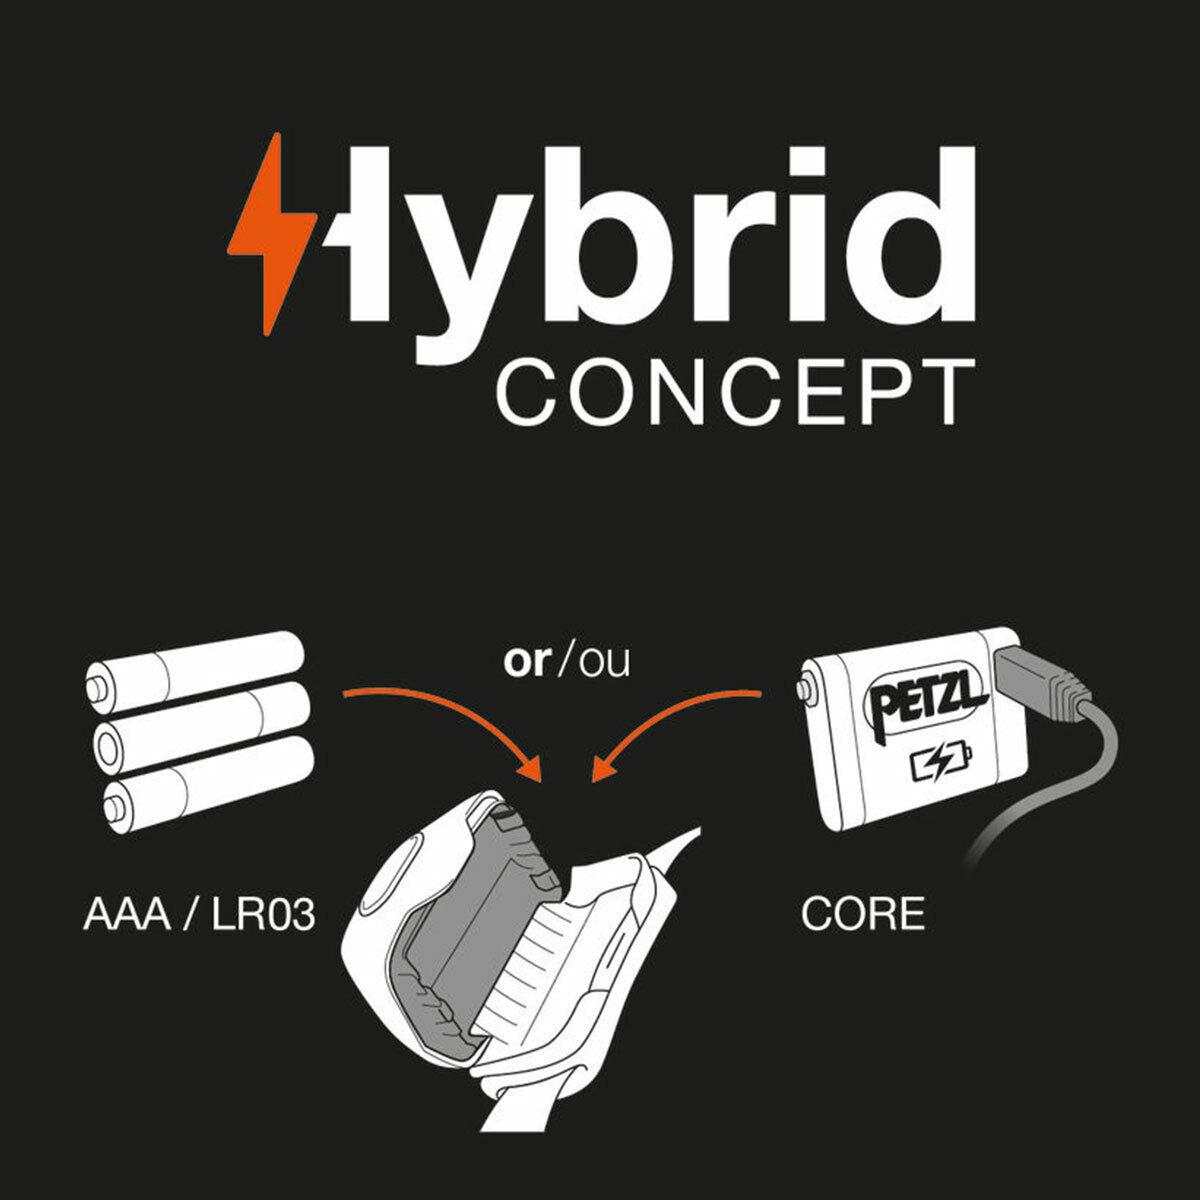 RGB 250 Lumens LED Head Torch E89 Hybrid Concept CarpTactical Petzl Tactikka